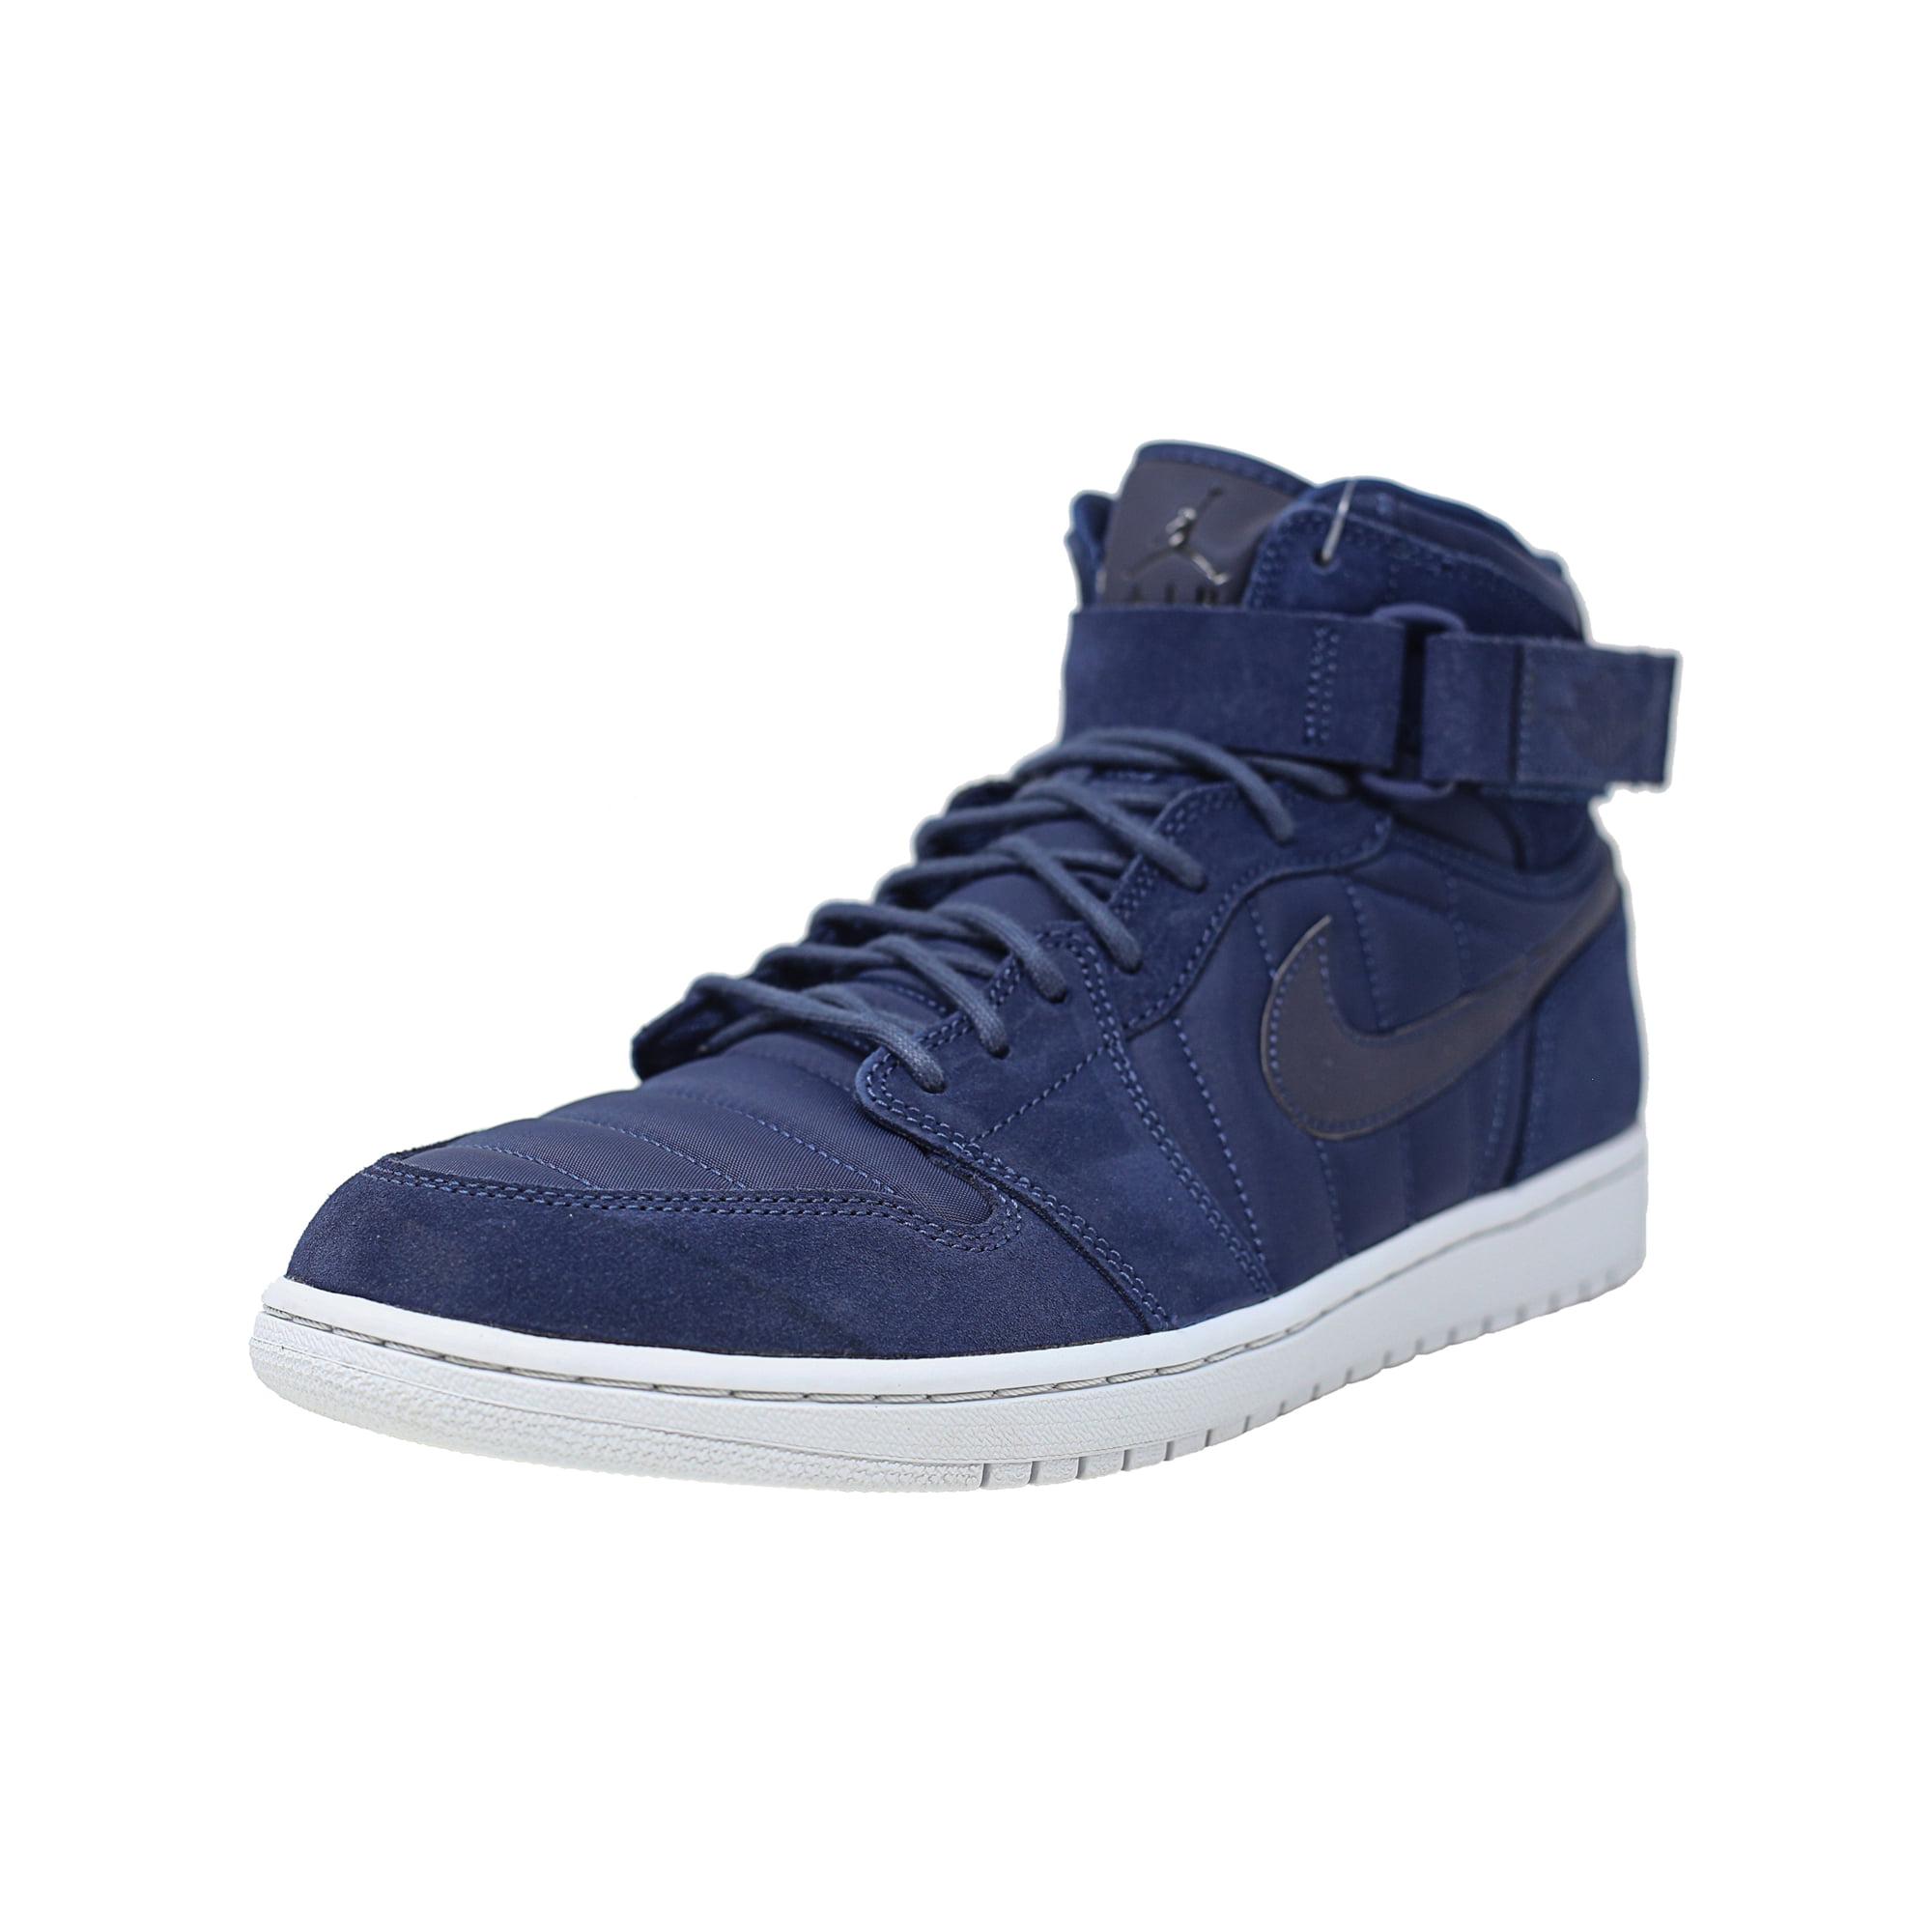 newest deef6 02bee Nike Men's Air Jordan 1 High Strap Black / - Pure Platinum High-Top  Basketball Shoe 8.5M